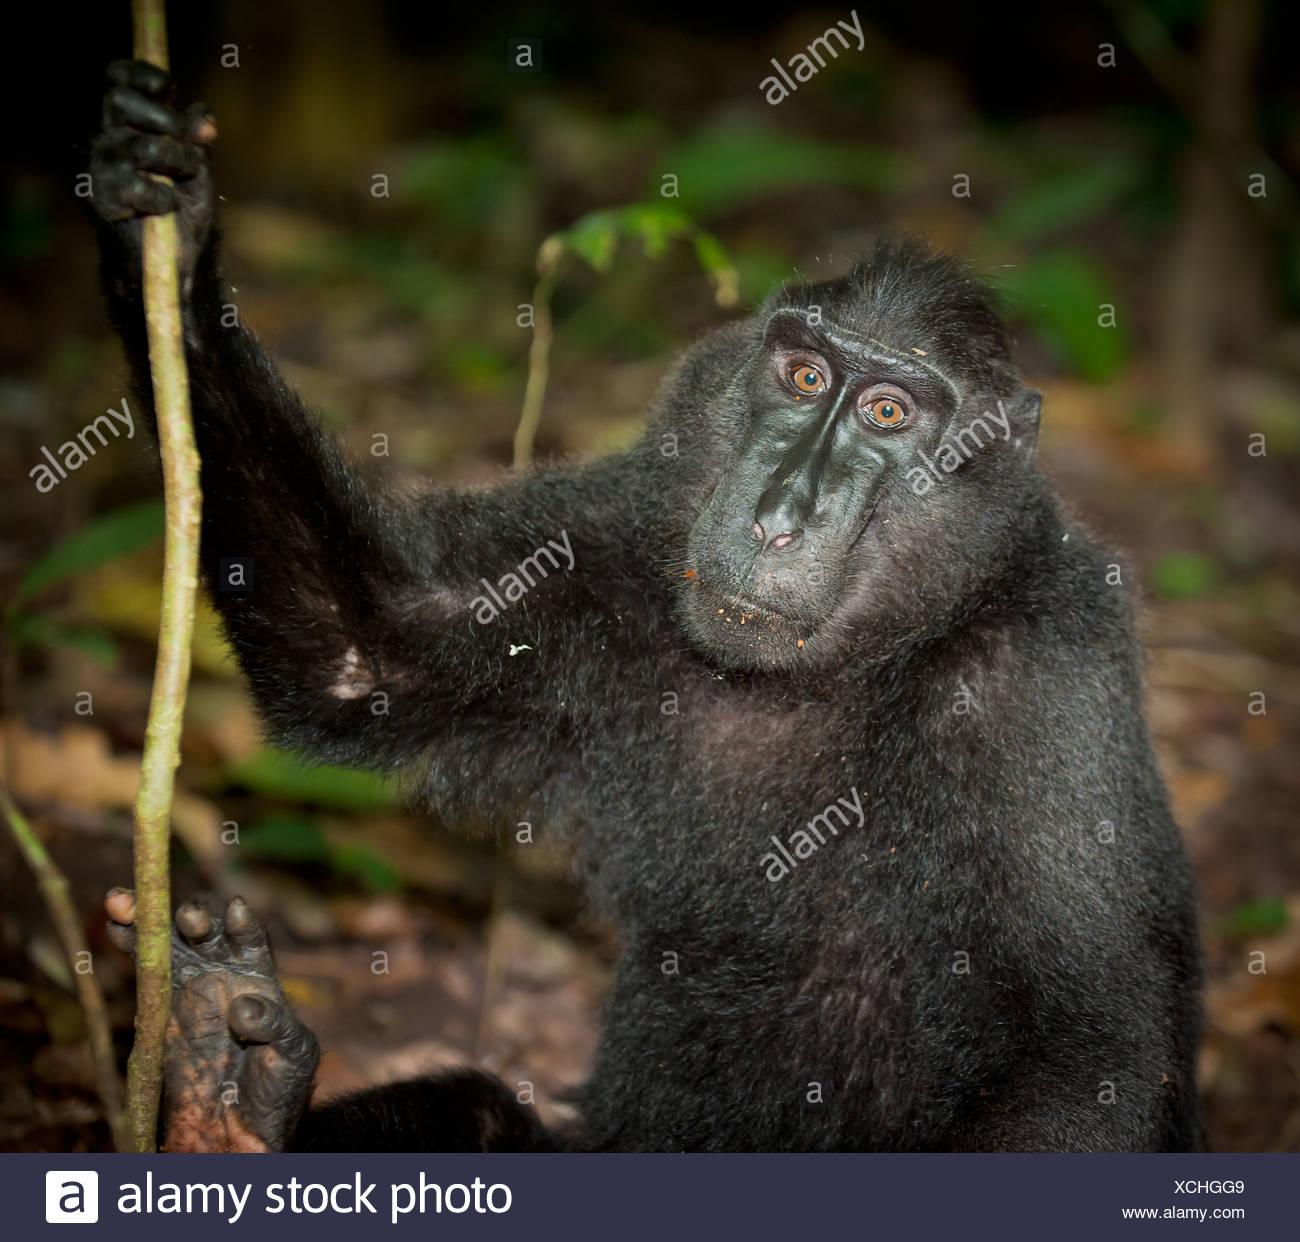 Black macaque, Sulawesi, Indonesia - Stock Image